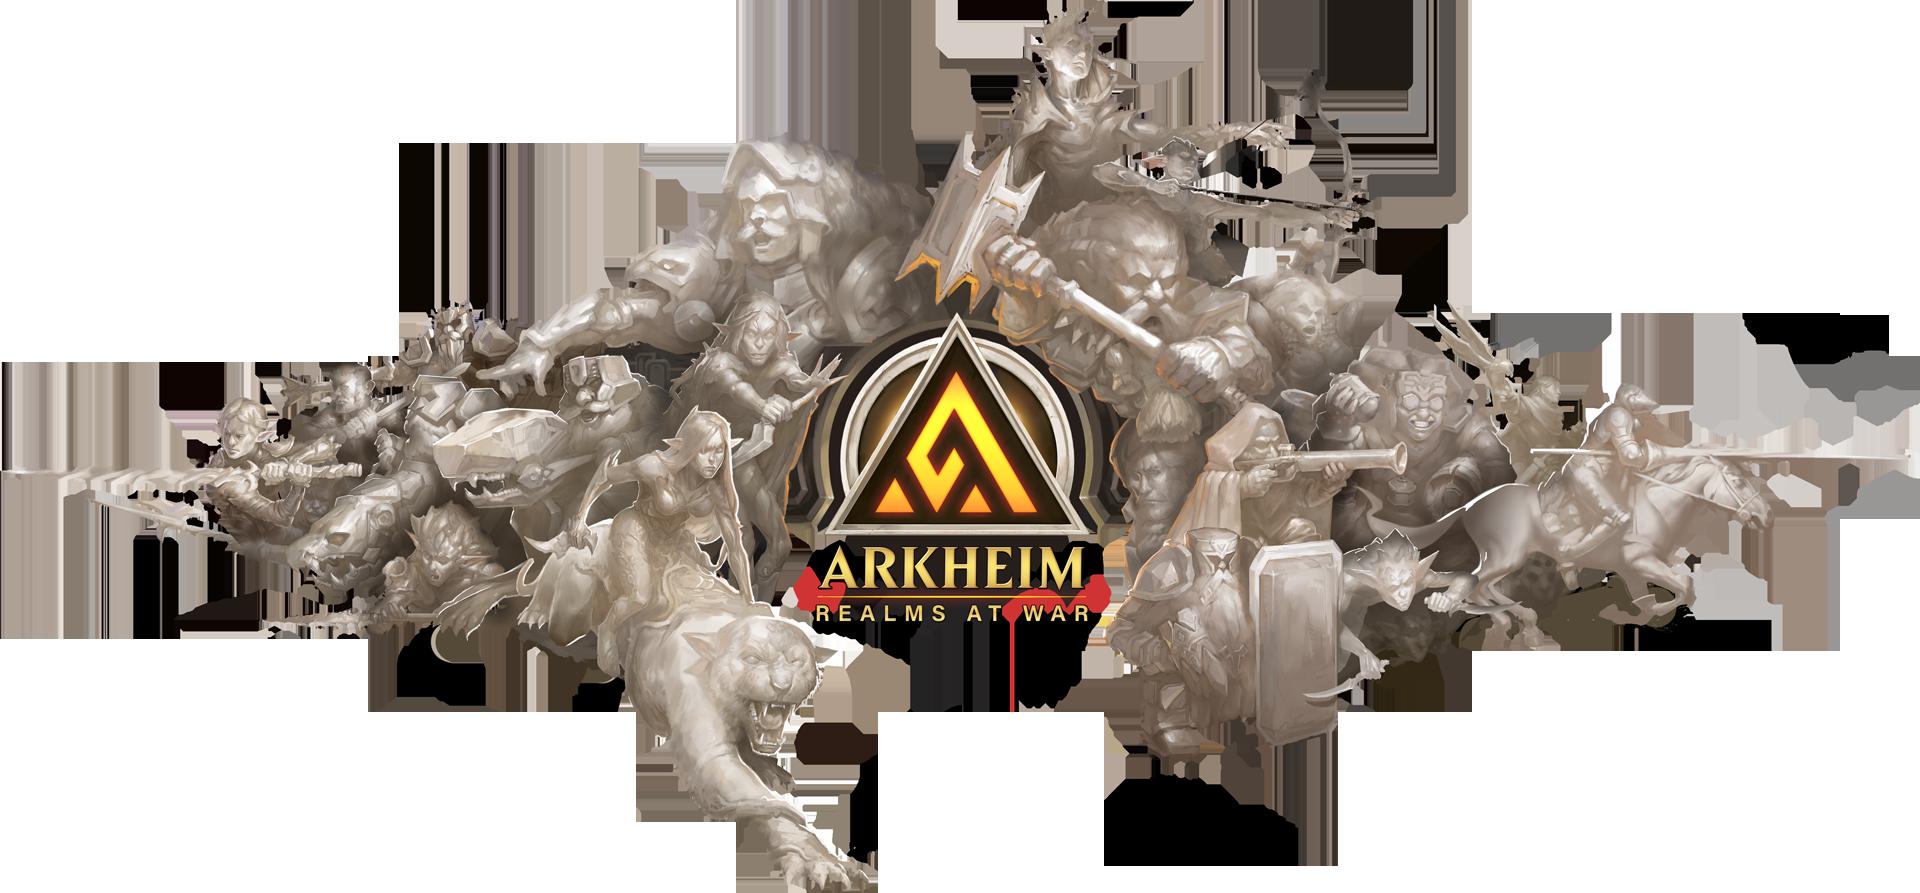 arkheim-keyart-with4.72daca6f3a2c7e1d1e3c_1_.png